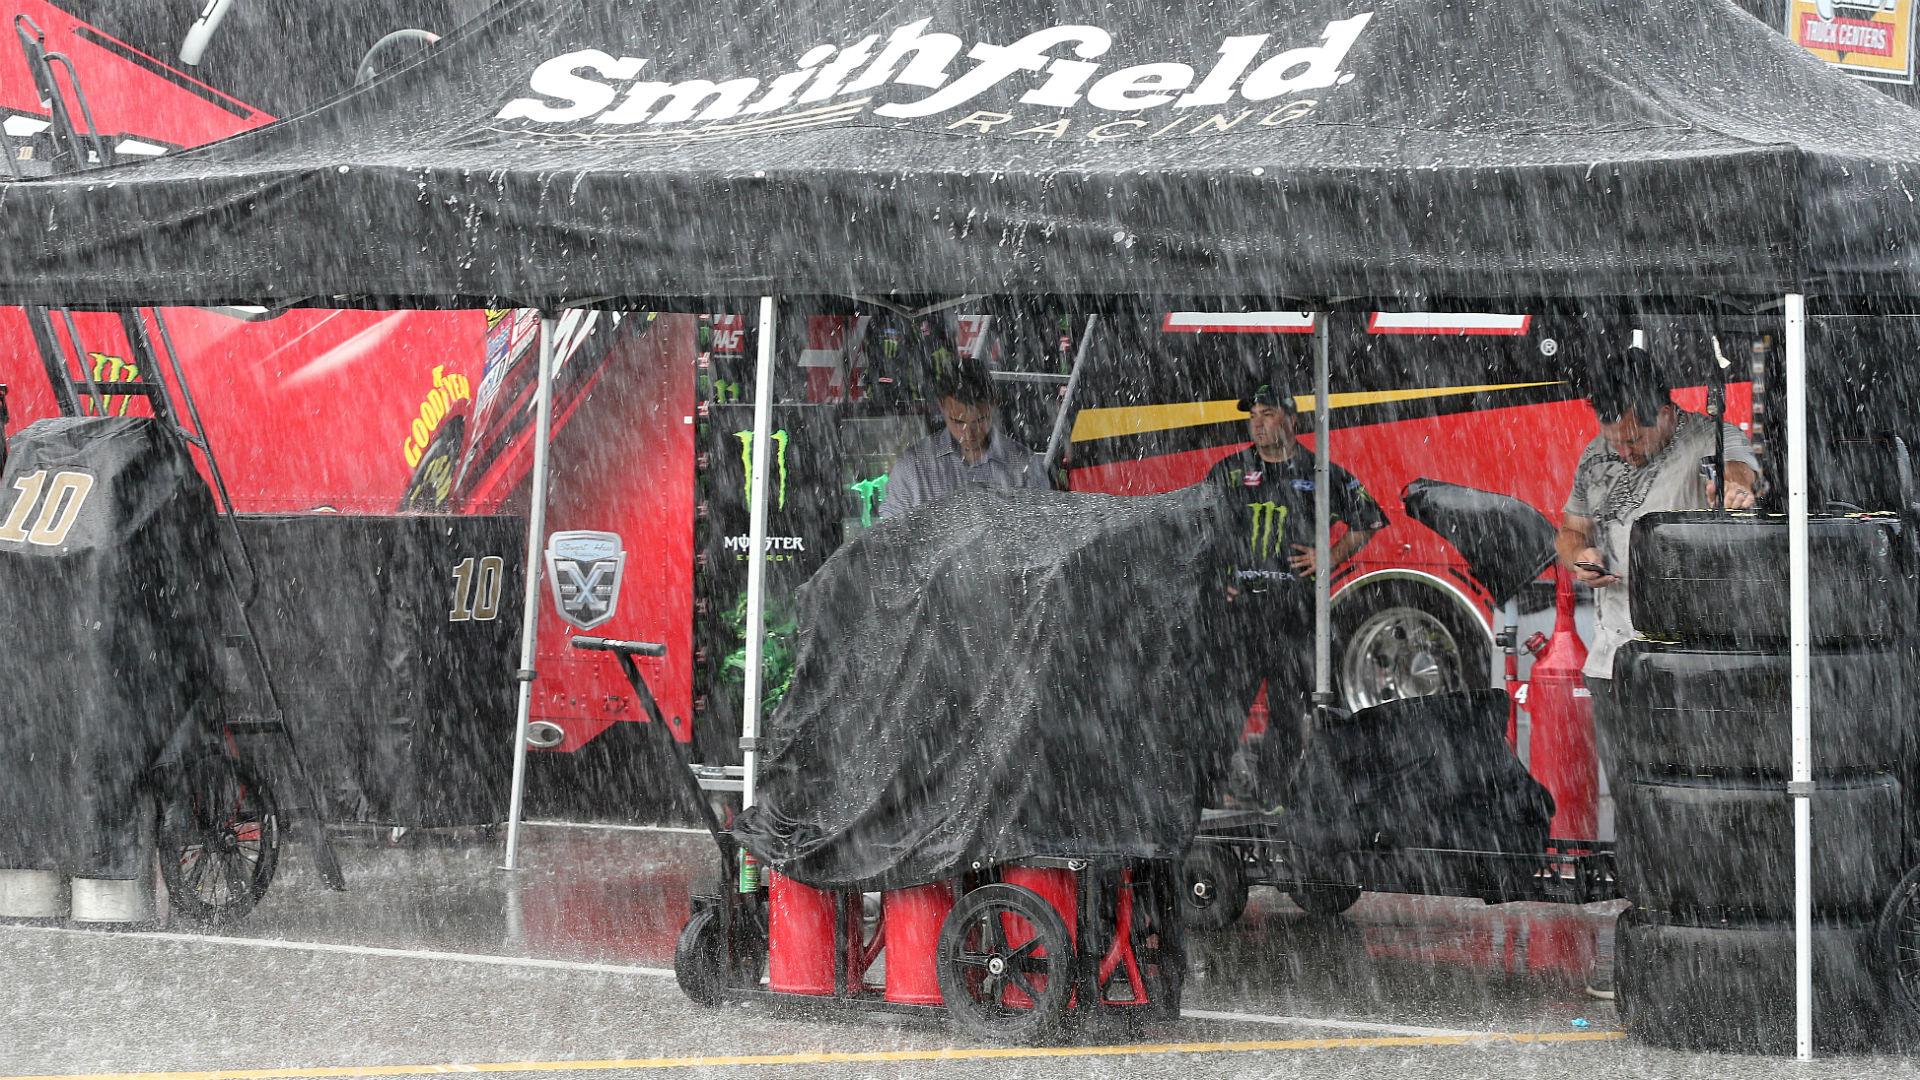 NASCAR at Daytona: Rain postpones Coke Zero Sugar 400 to Sunday